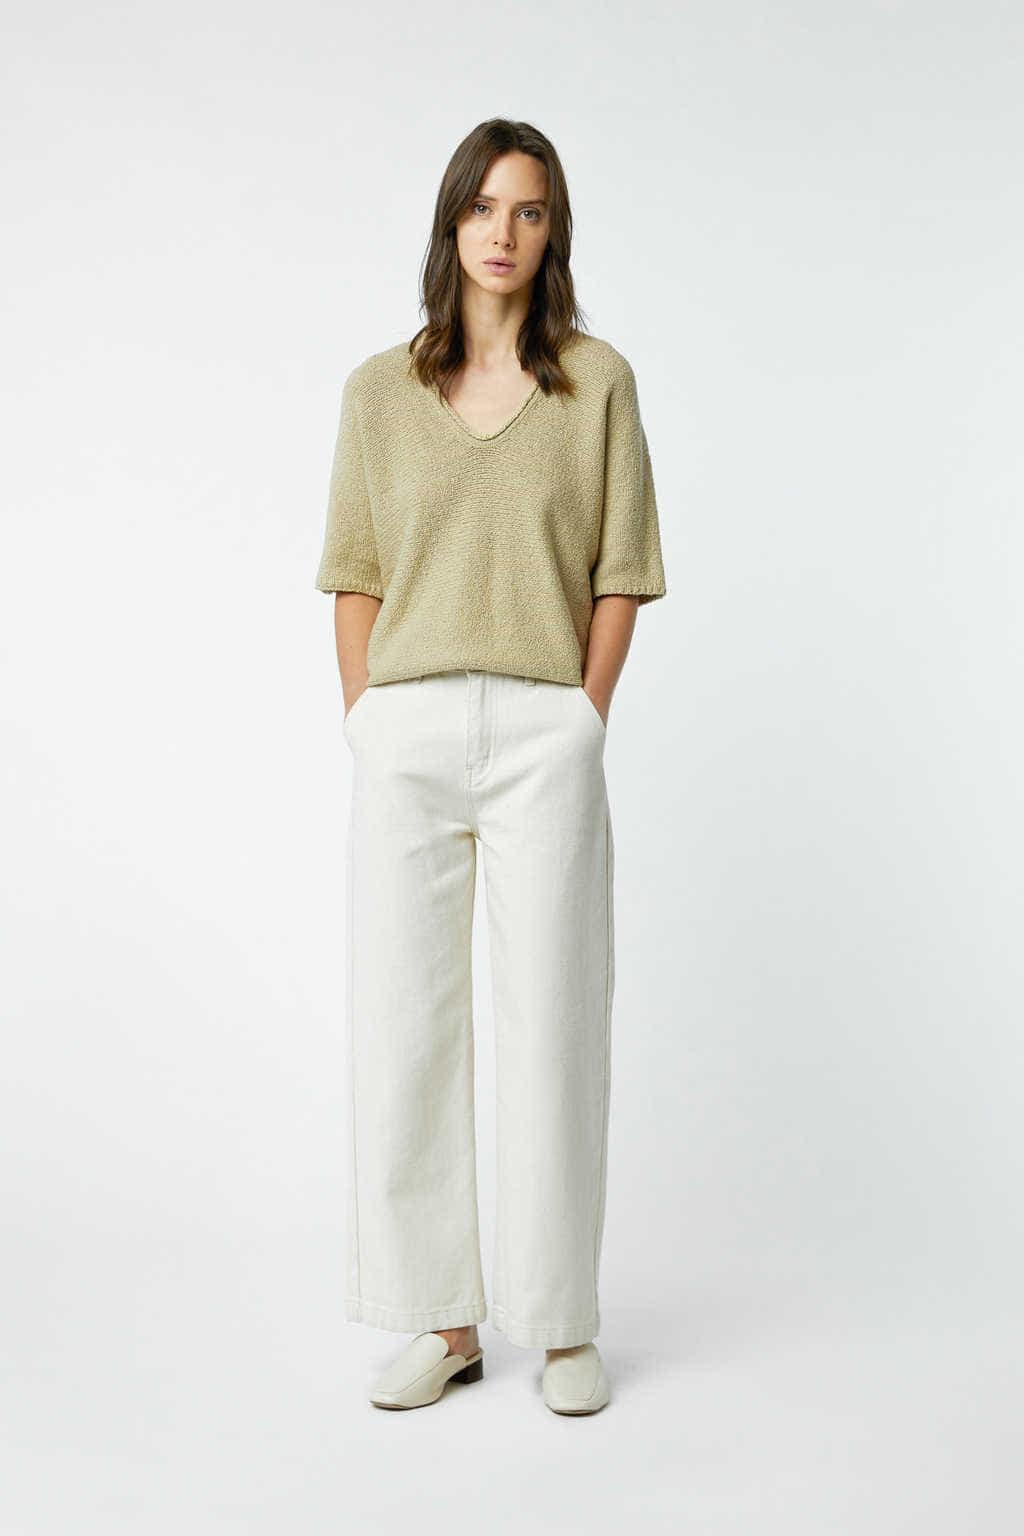 Sweater 3396 Sage 8